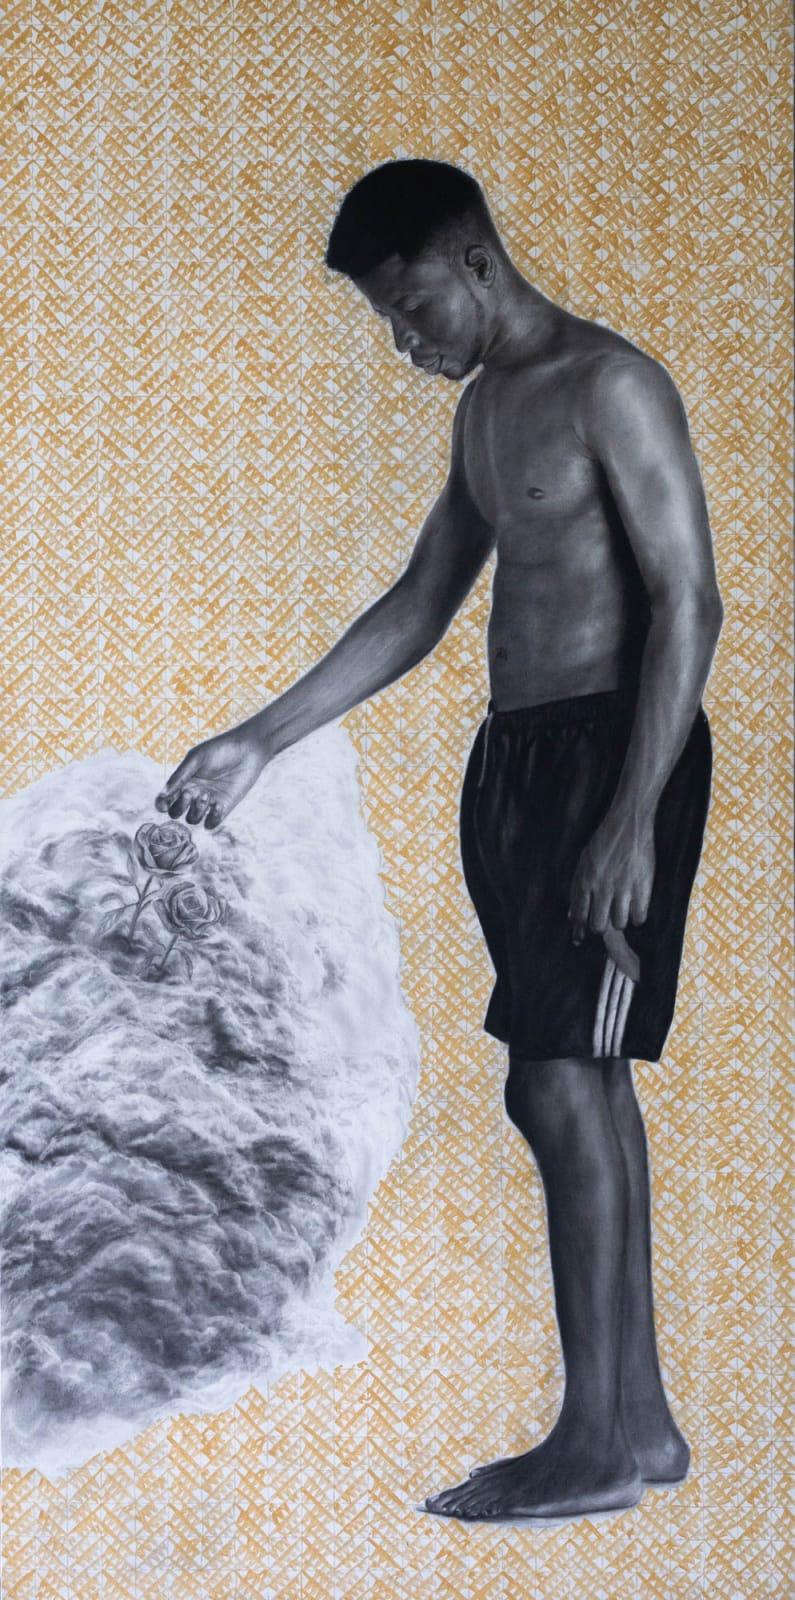 The Age of depression (III) 244 x 122 cm